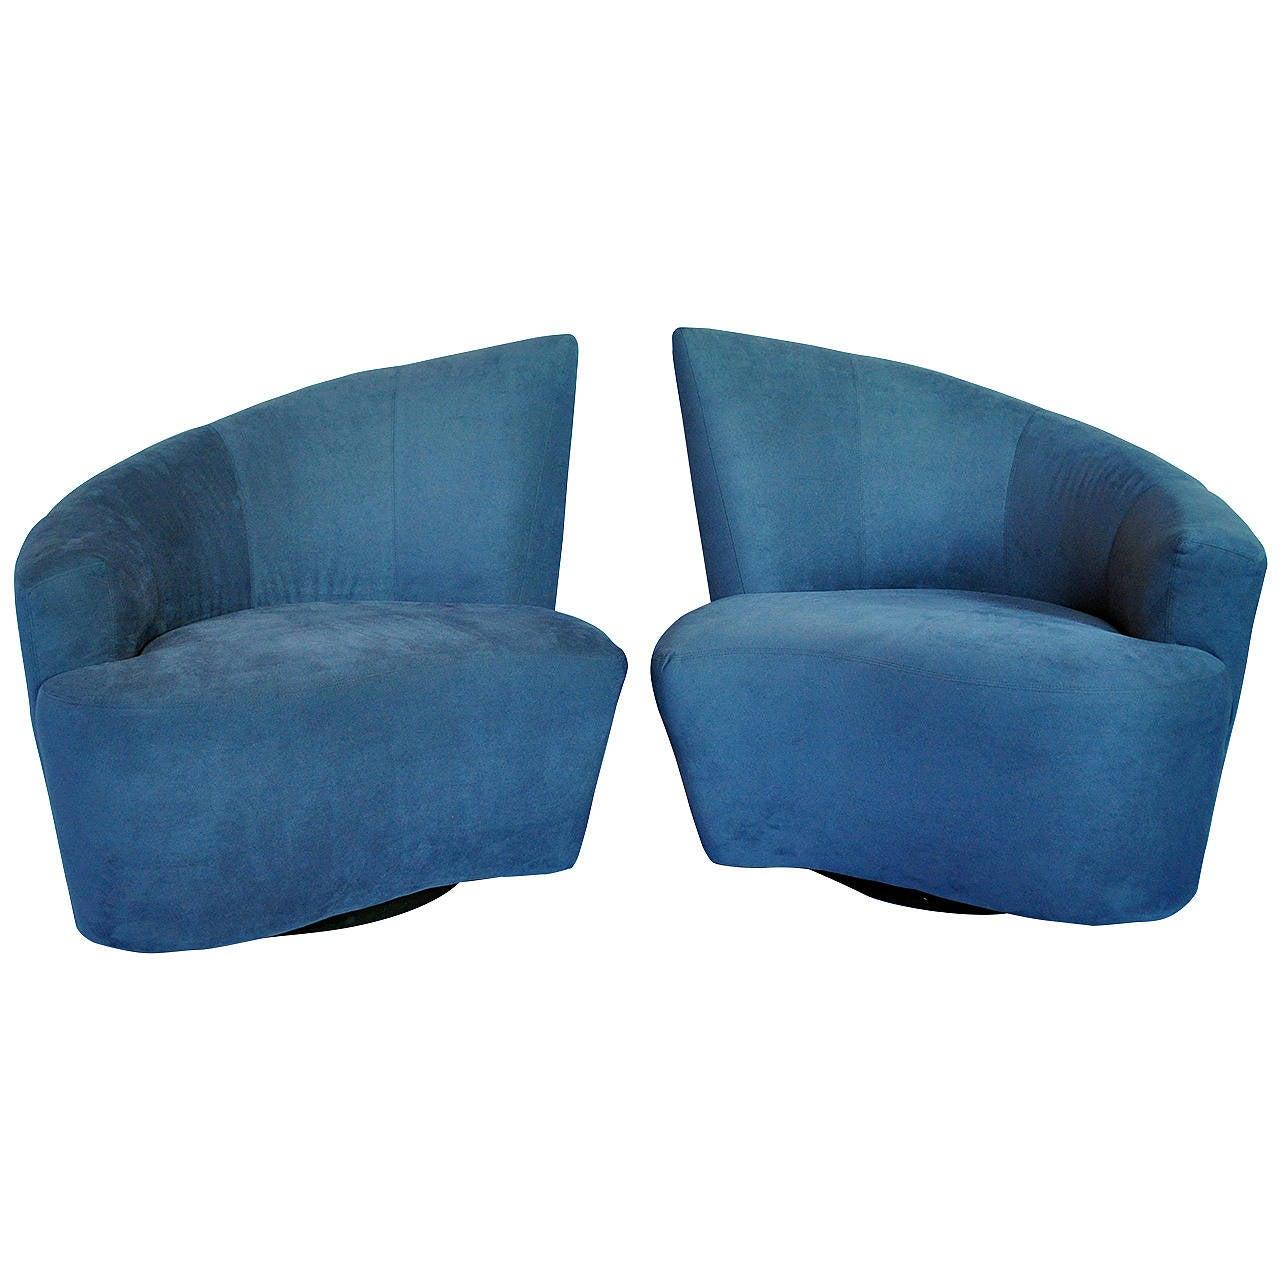 Vladimir Kagan Bilbao Swivel Lounge Chairs for Weiman Preview